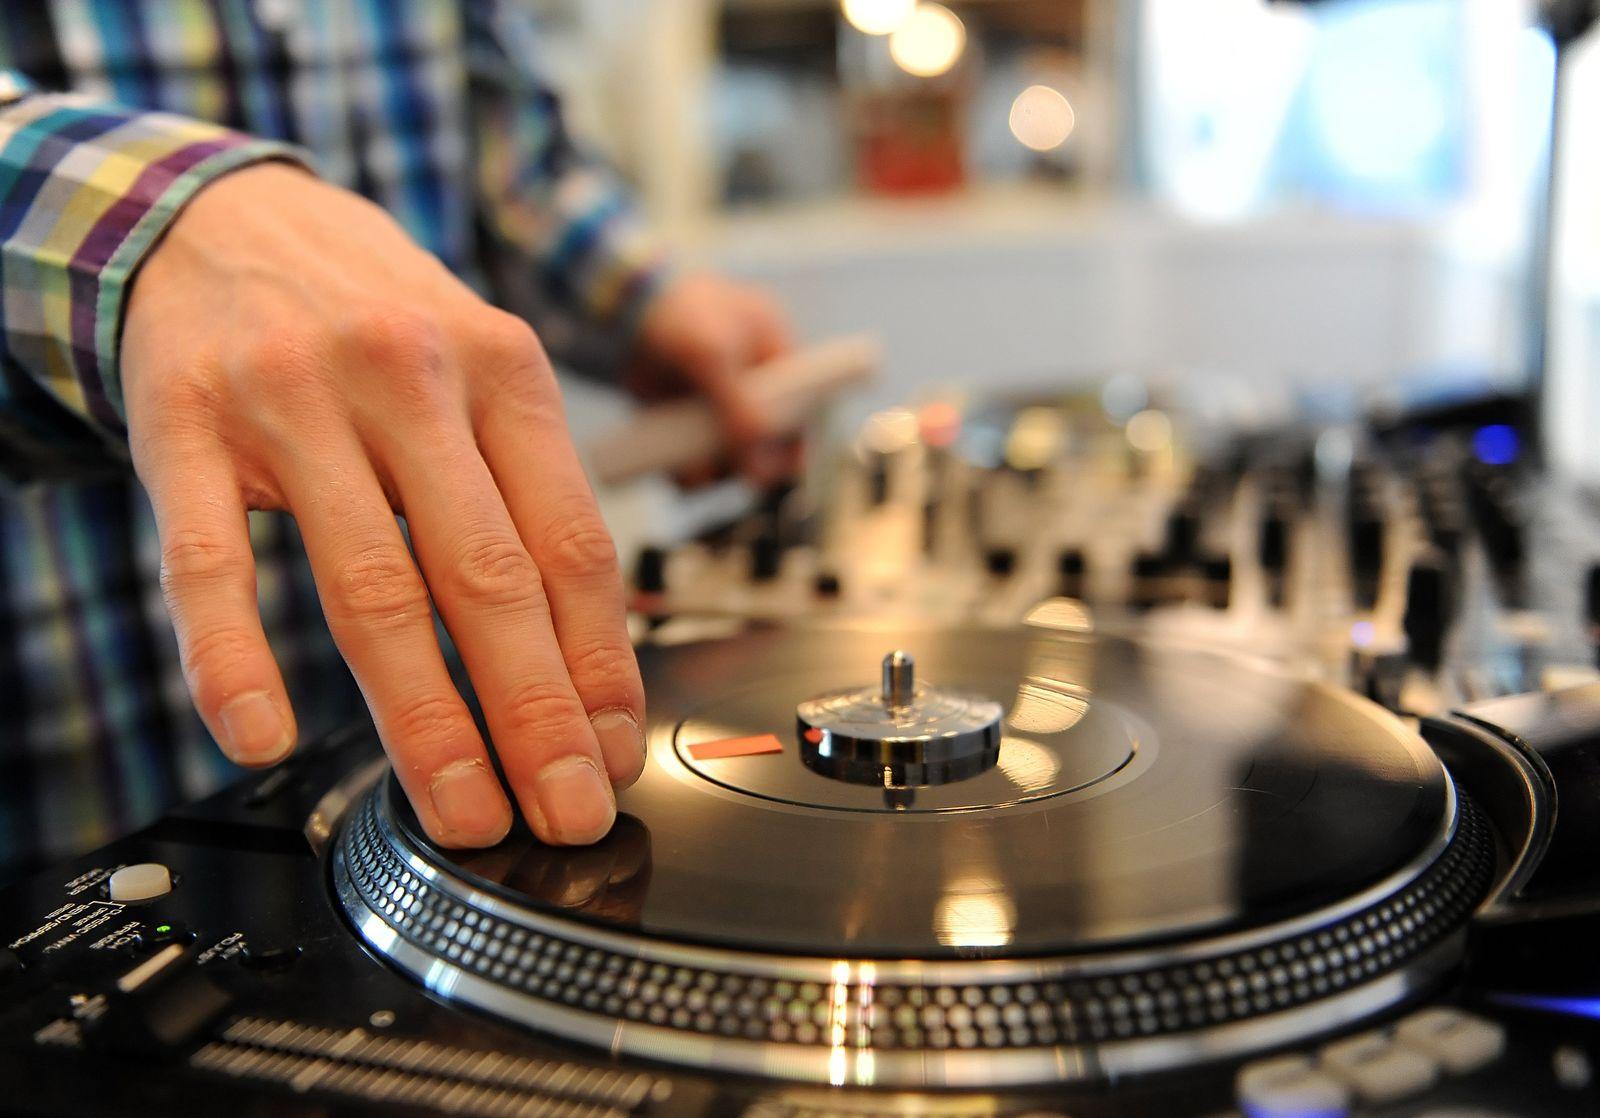 Musikmesse Popkomm 2011 / Schallplatte / Plattenspieler / DJ